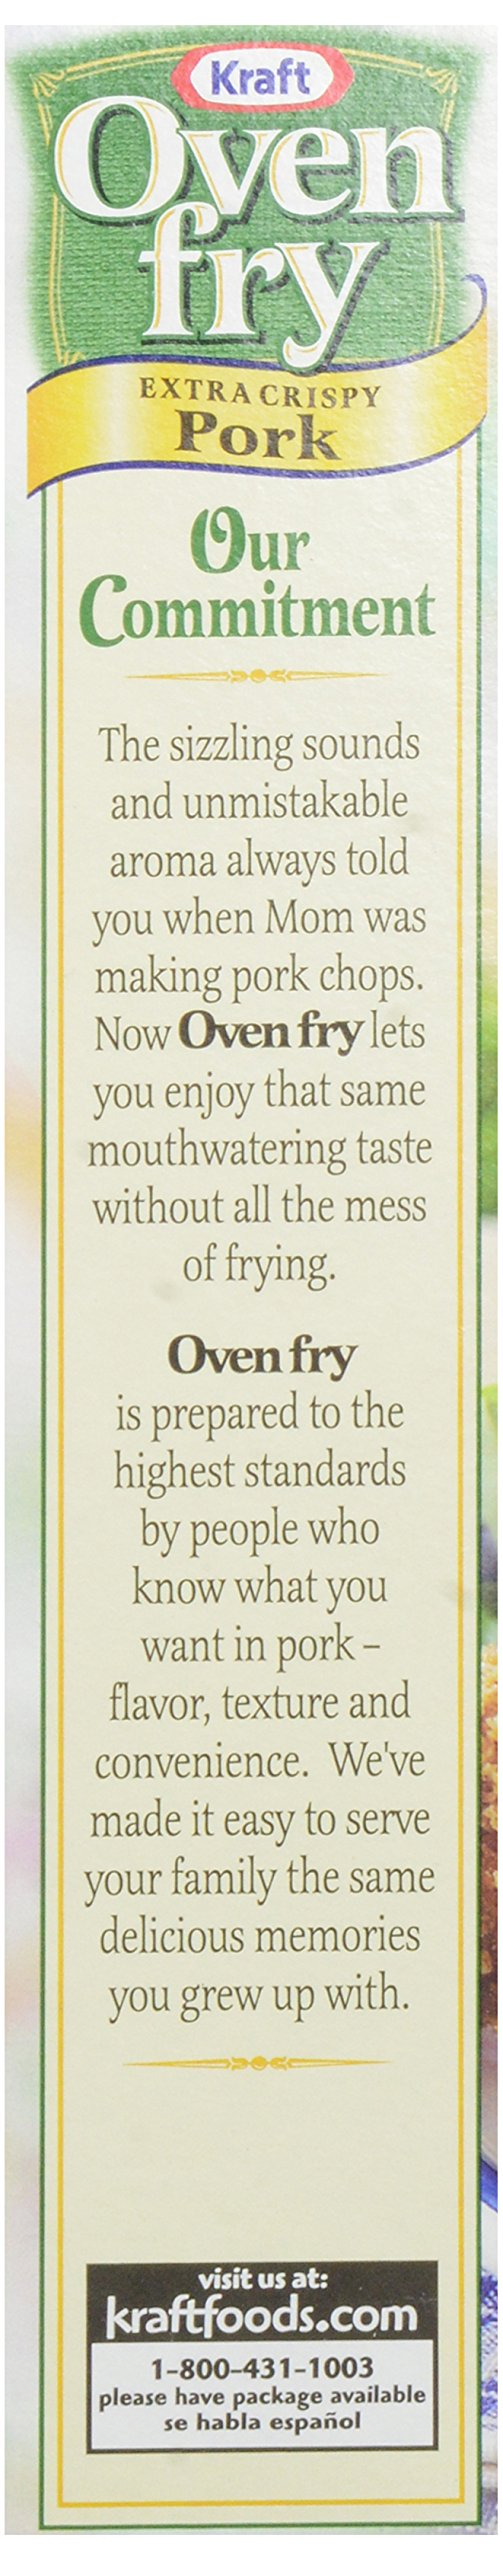 Kraft Oven Fry Seasoned Coating Mix for Pork, Extra Crispy, 4.2 oz(pack of 8) by Kraft Oven Fry (Image #6)